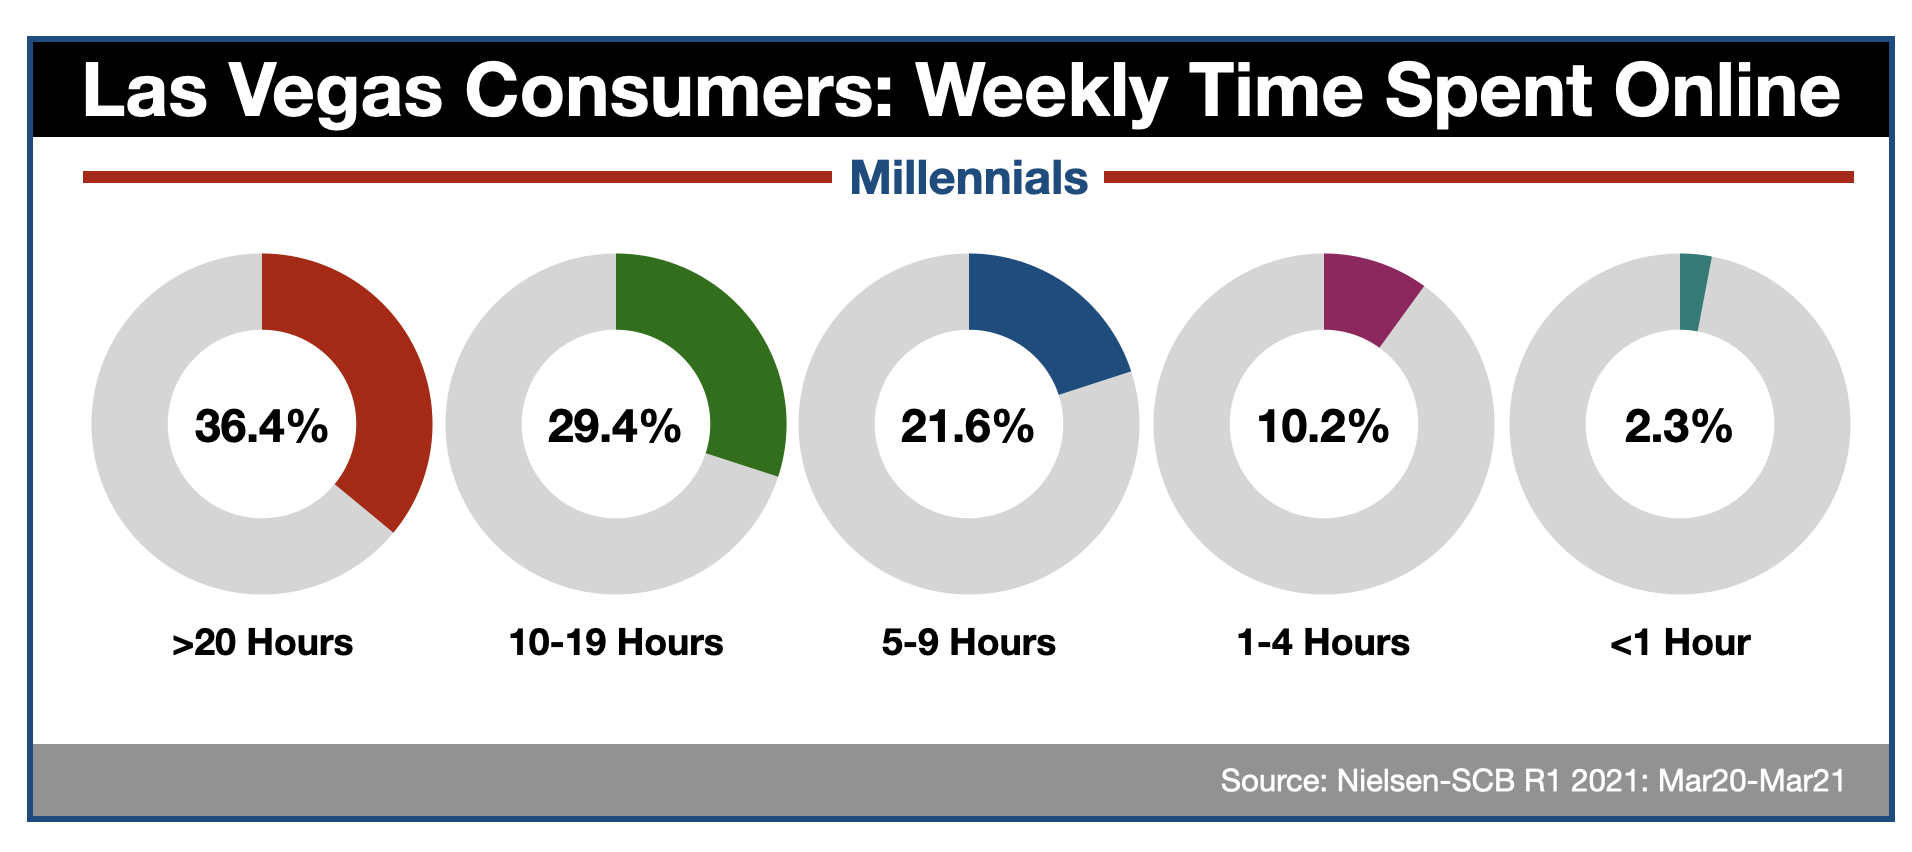 Advertising Online In Las Vegas: Millennials